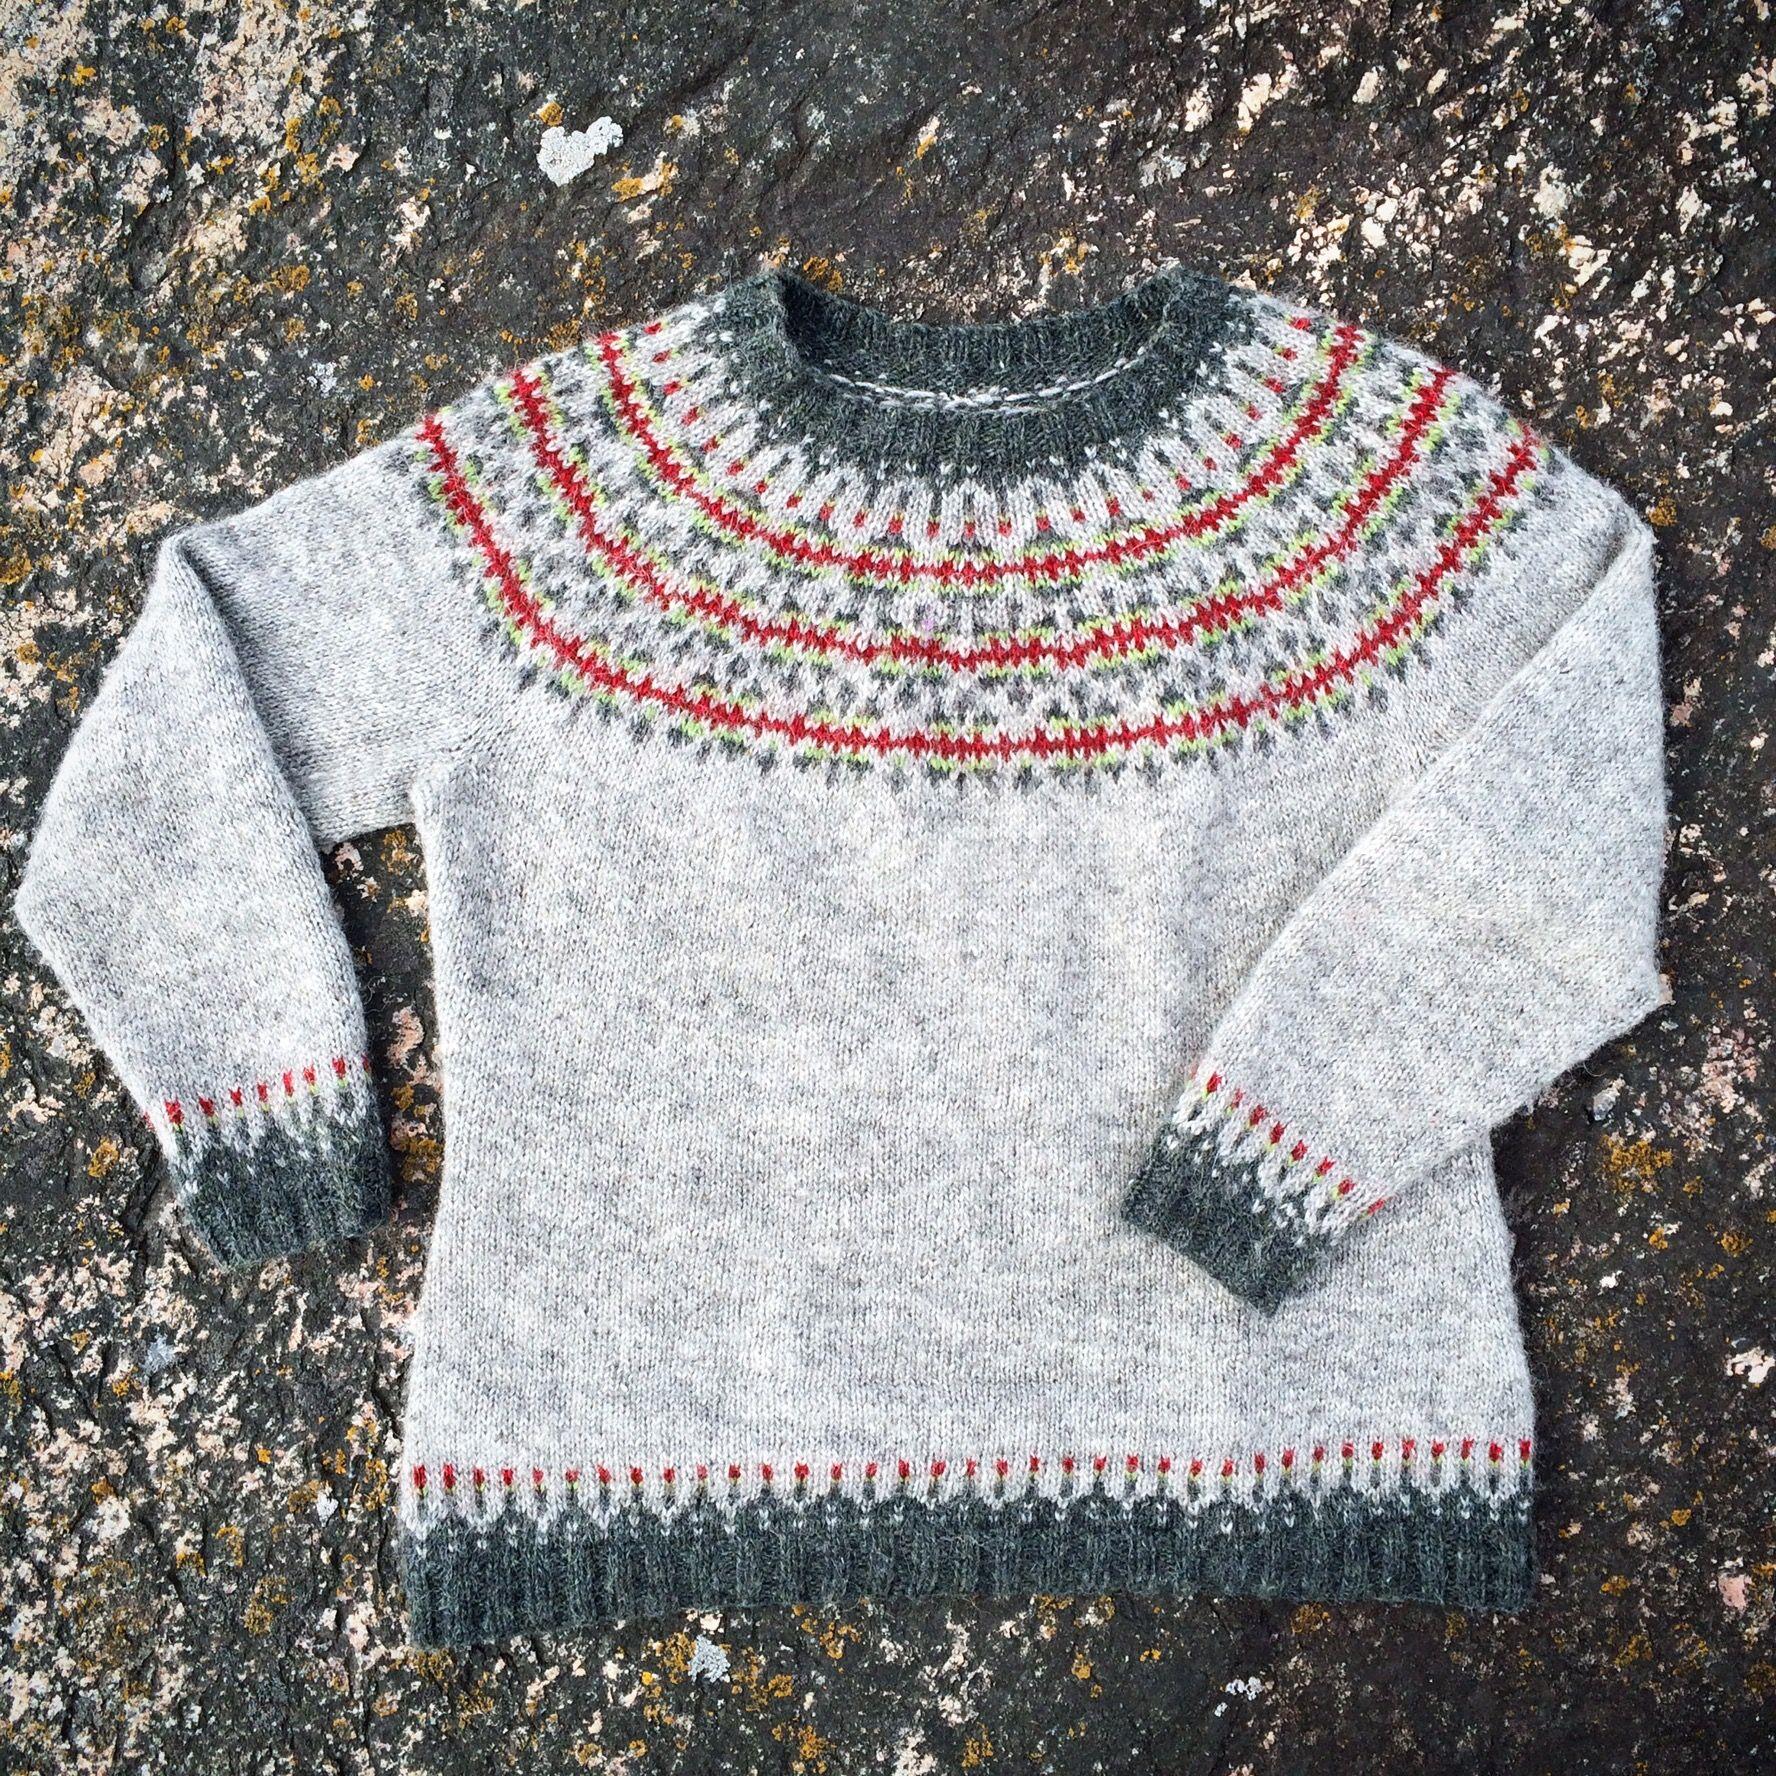 The icelandic sweater Ásta Sóllilja knitted with Ístex Létt-lopi ...